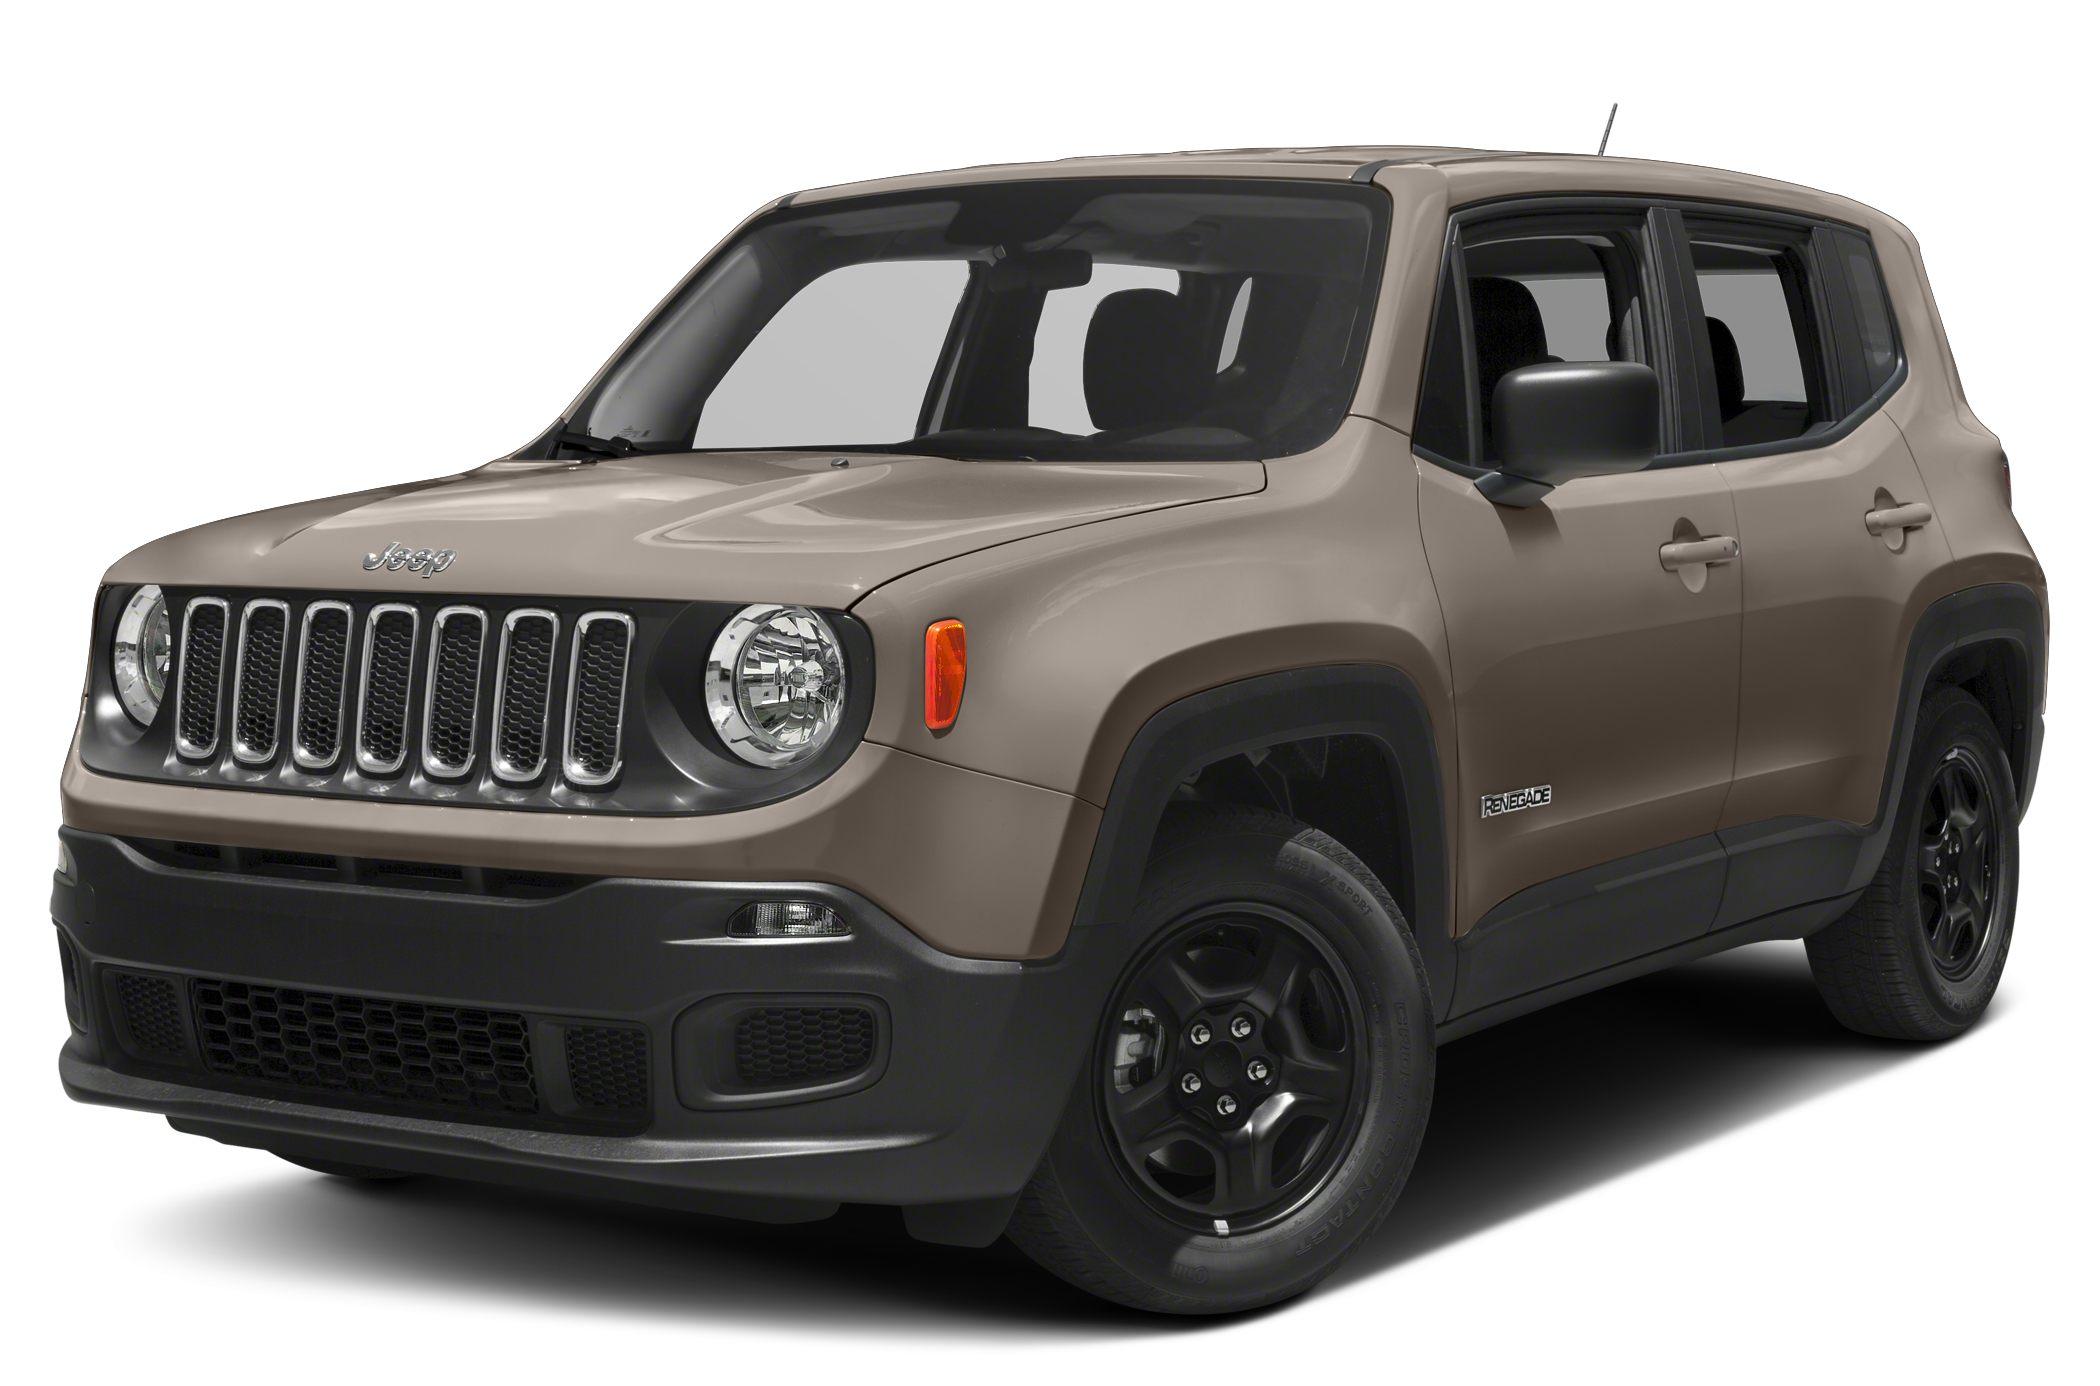 2017 Jeep Renegade.